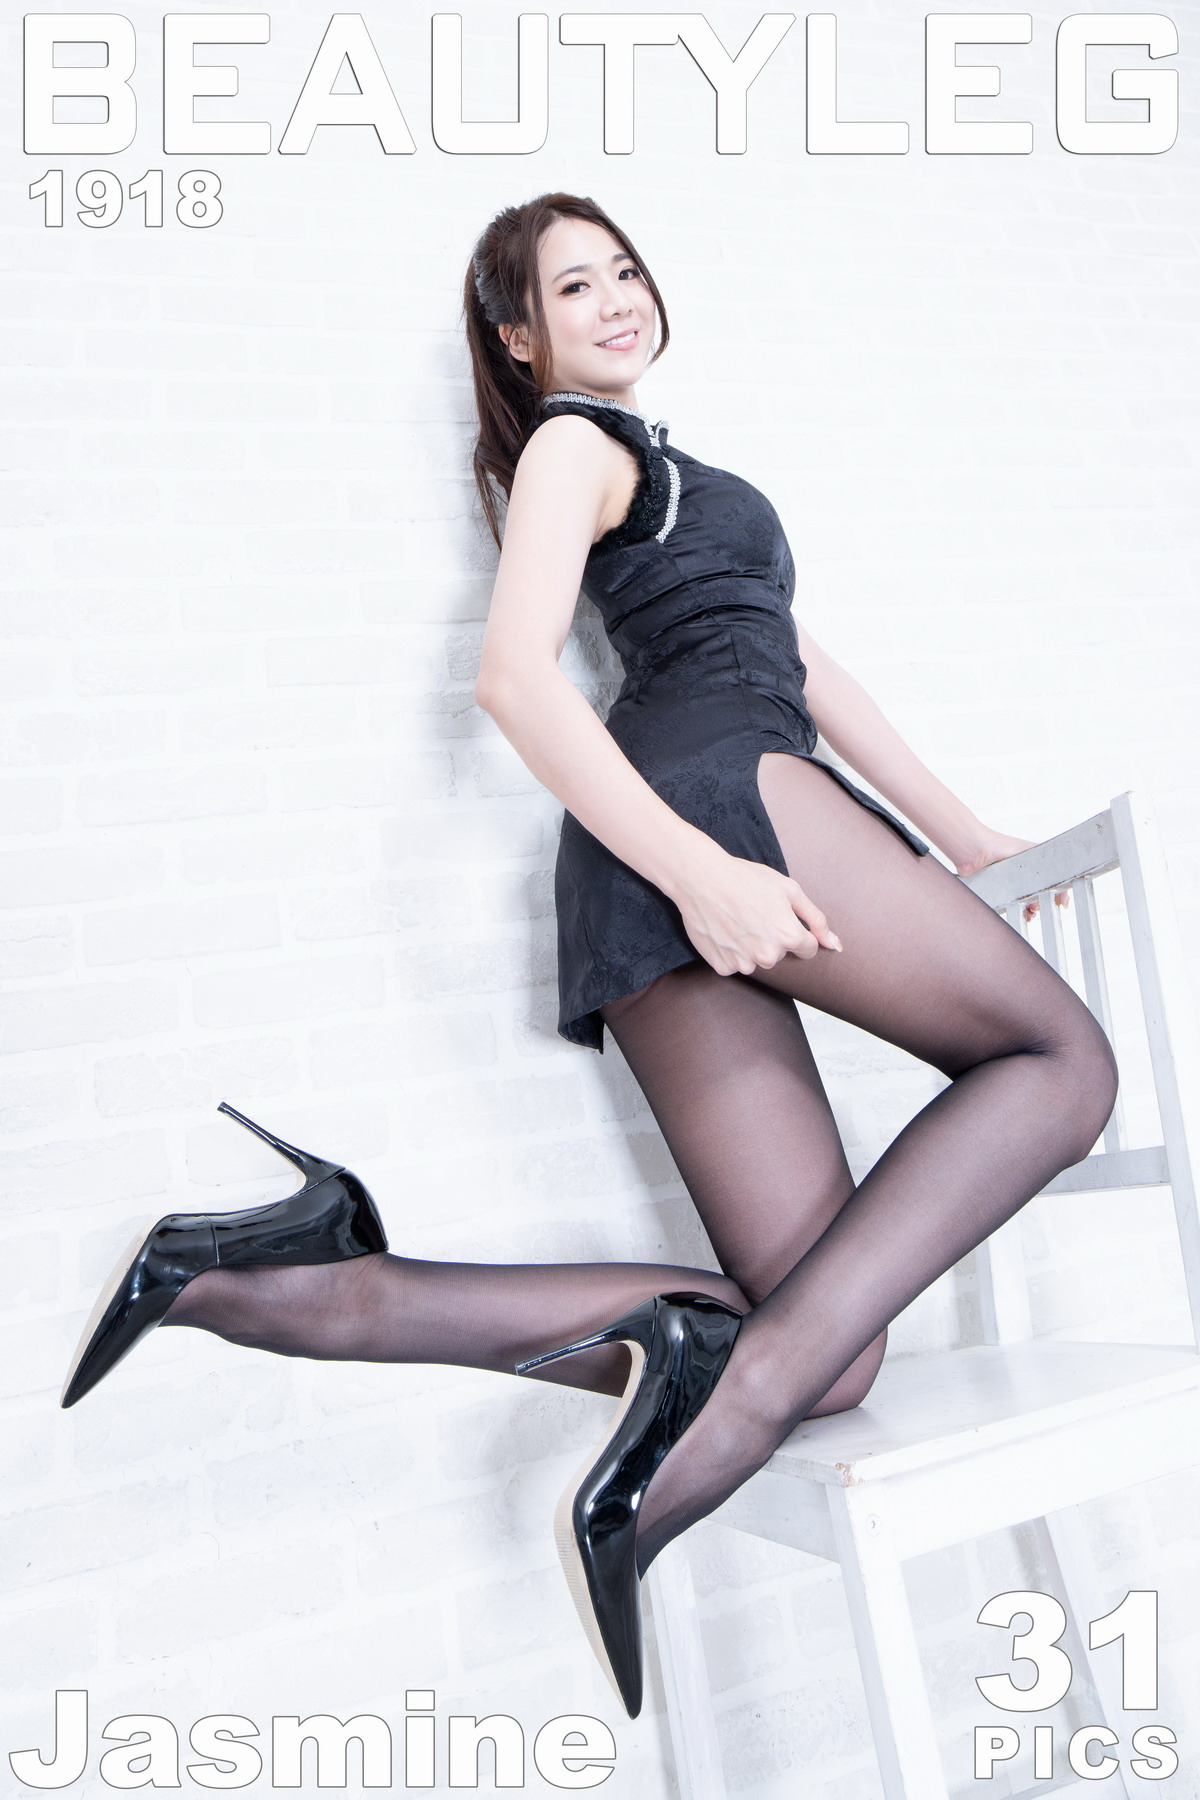 [Beautyleg]美腿写真 2020.05.06 No.1918 Jasmine[/290M]